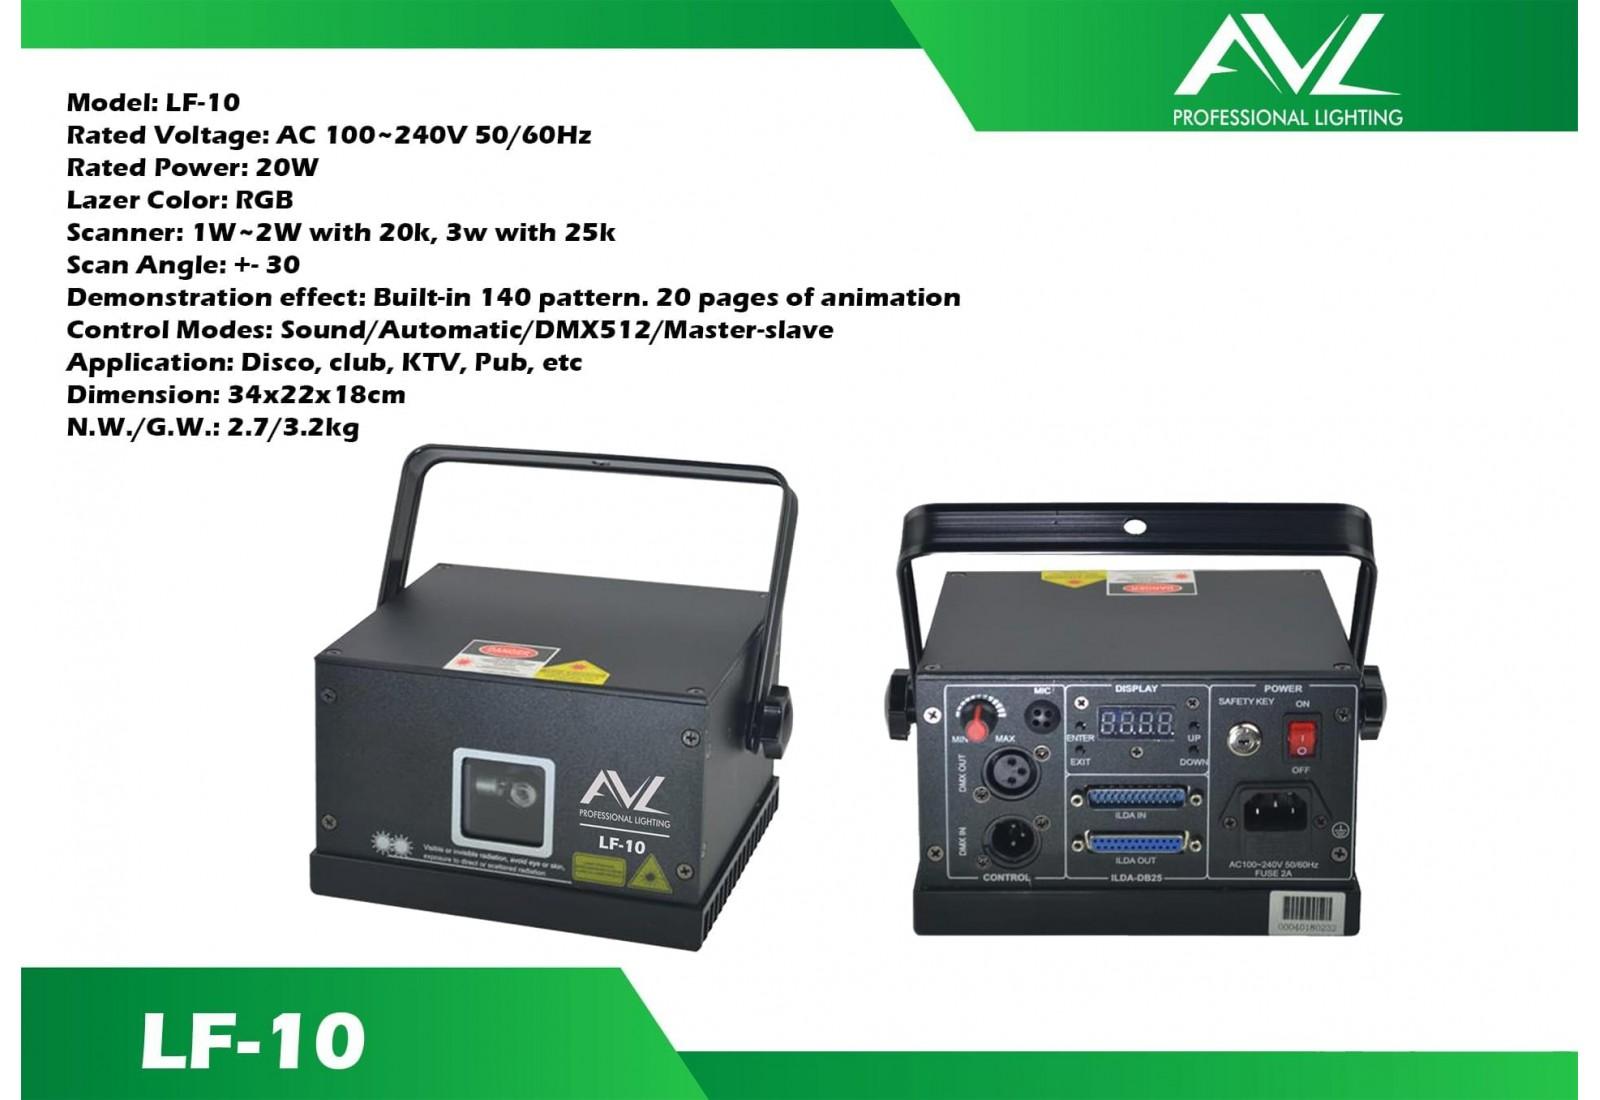 AVL LF-10